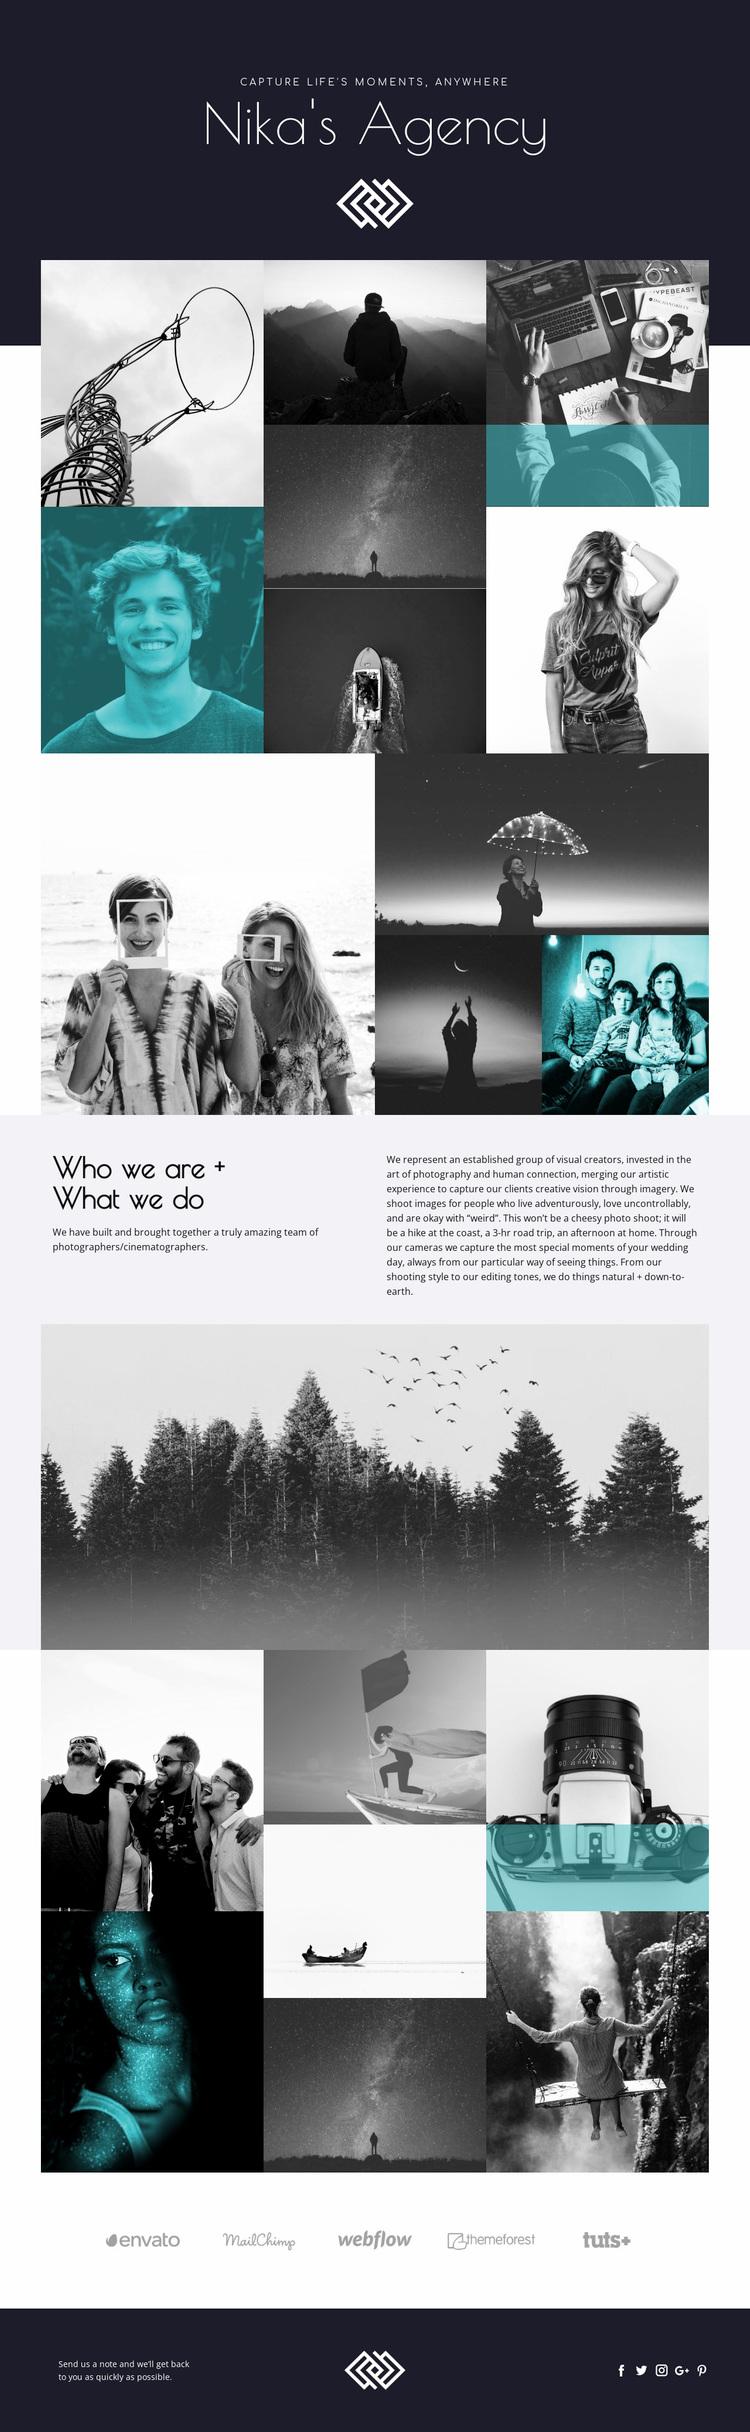 Nika's Agency Website Design